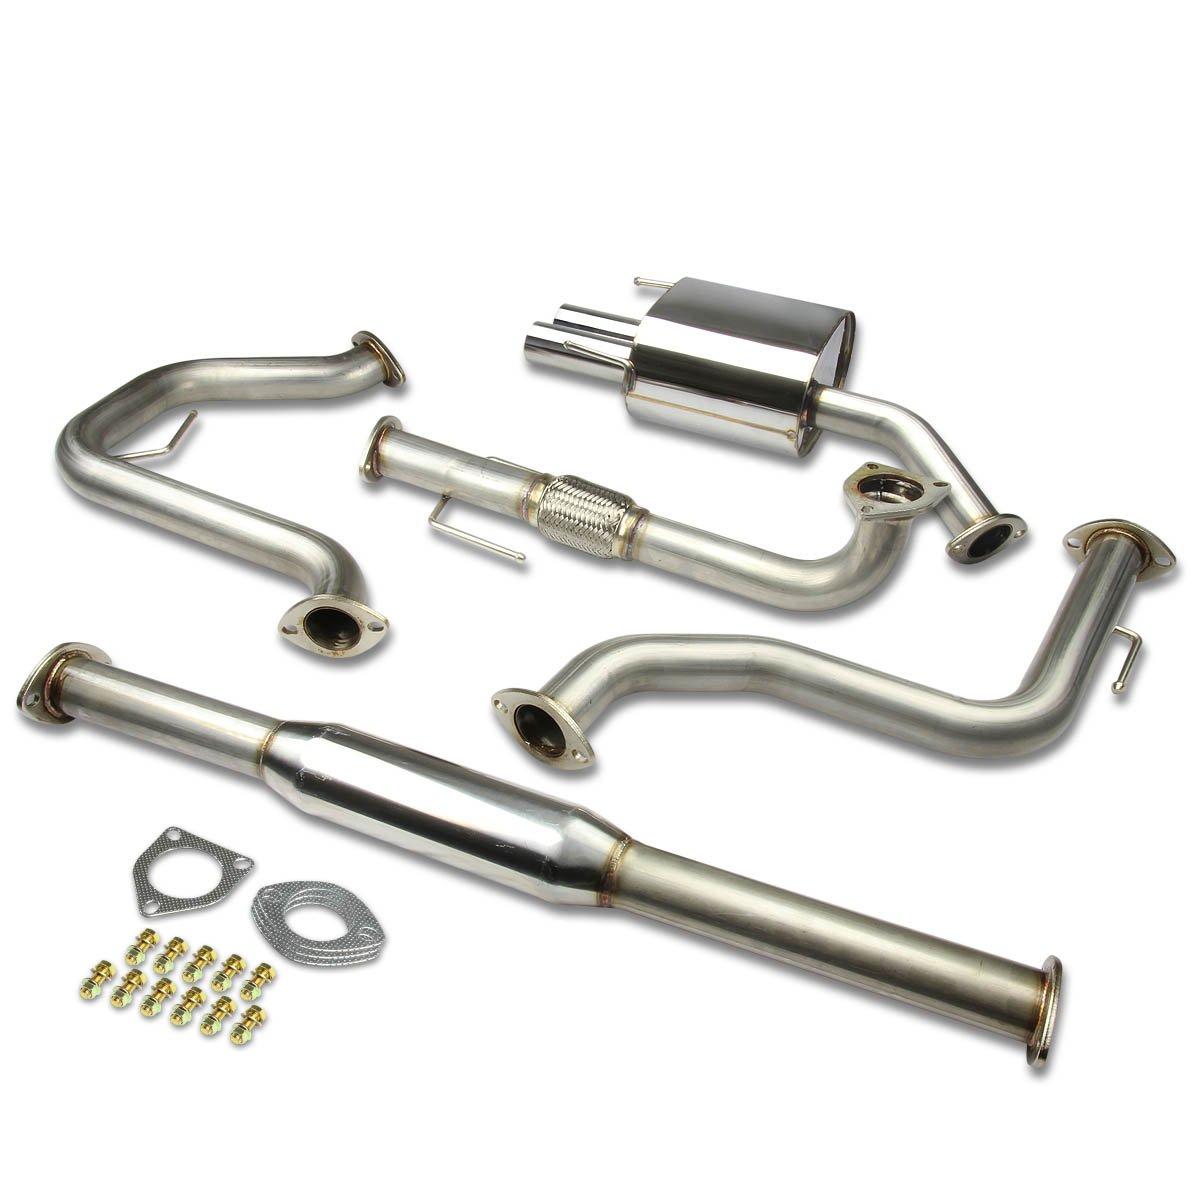 DNA Motoring CBE-SAAB9306 CBESAAB9306 Stainless Steel Catback Exhaust System